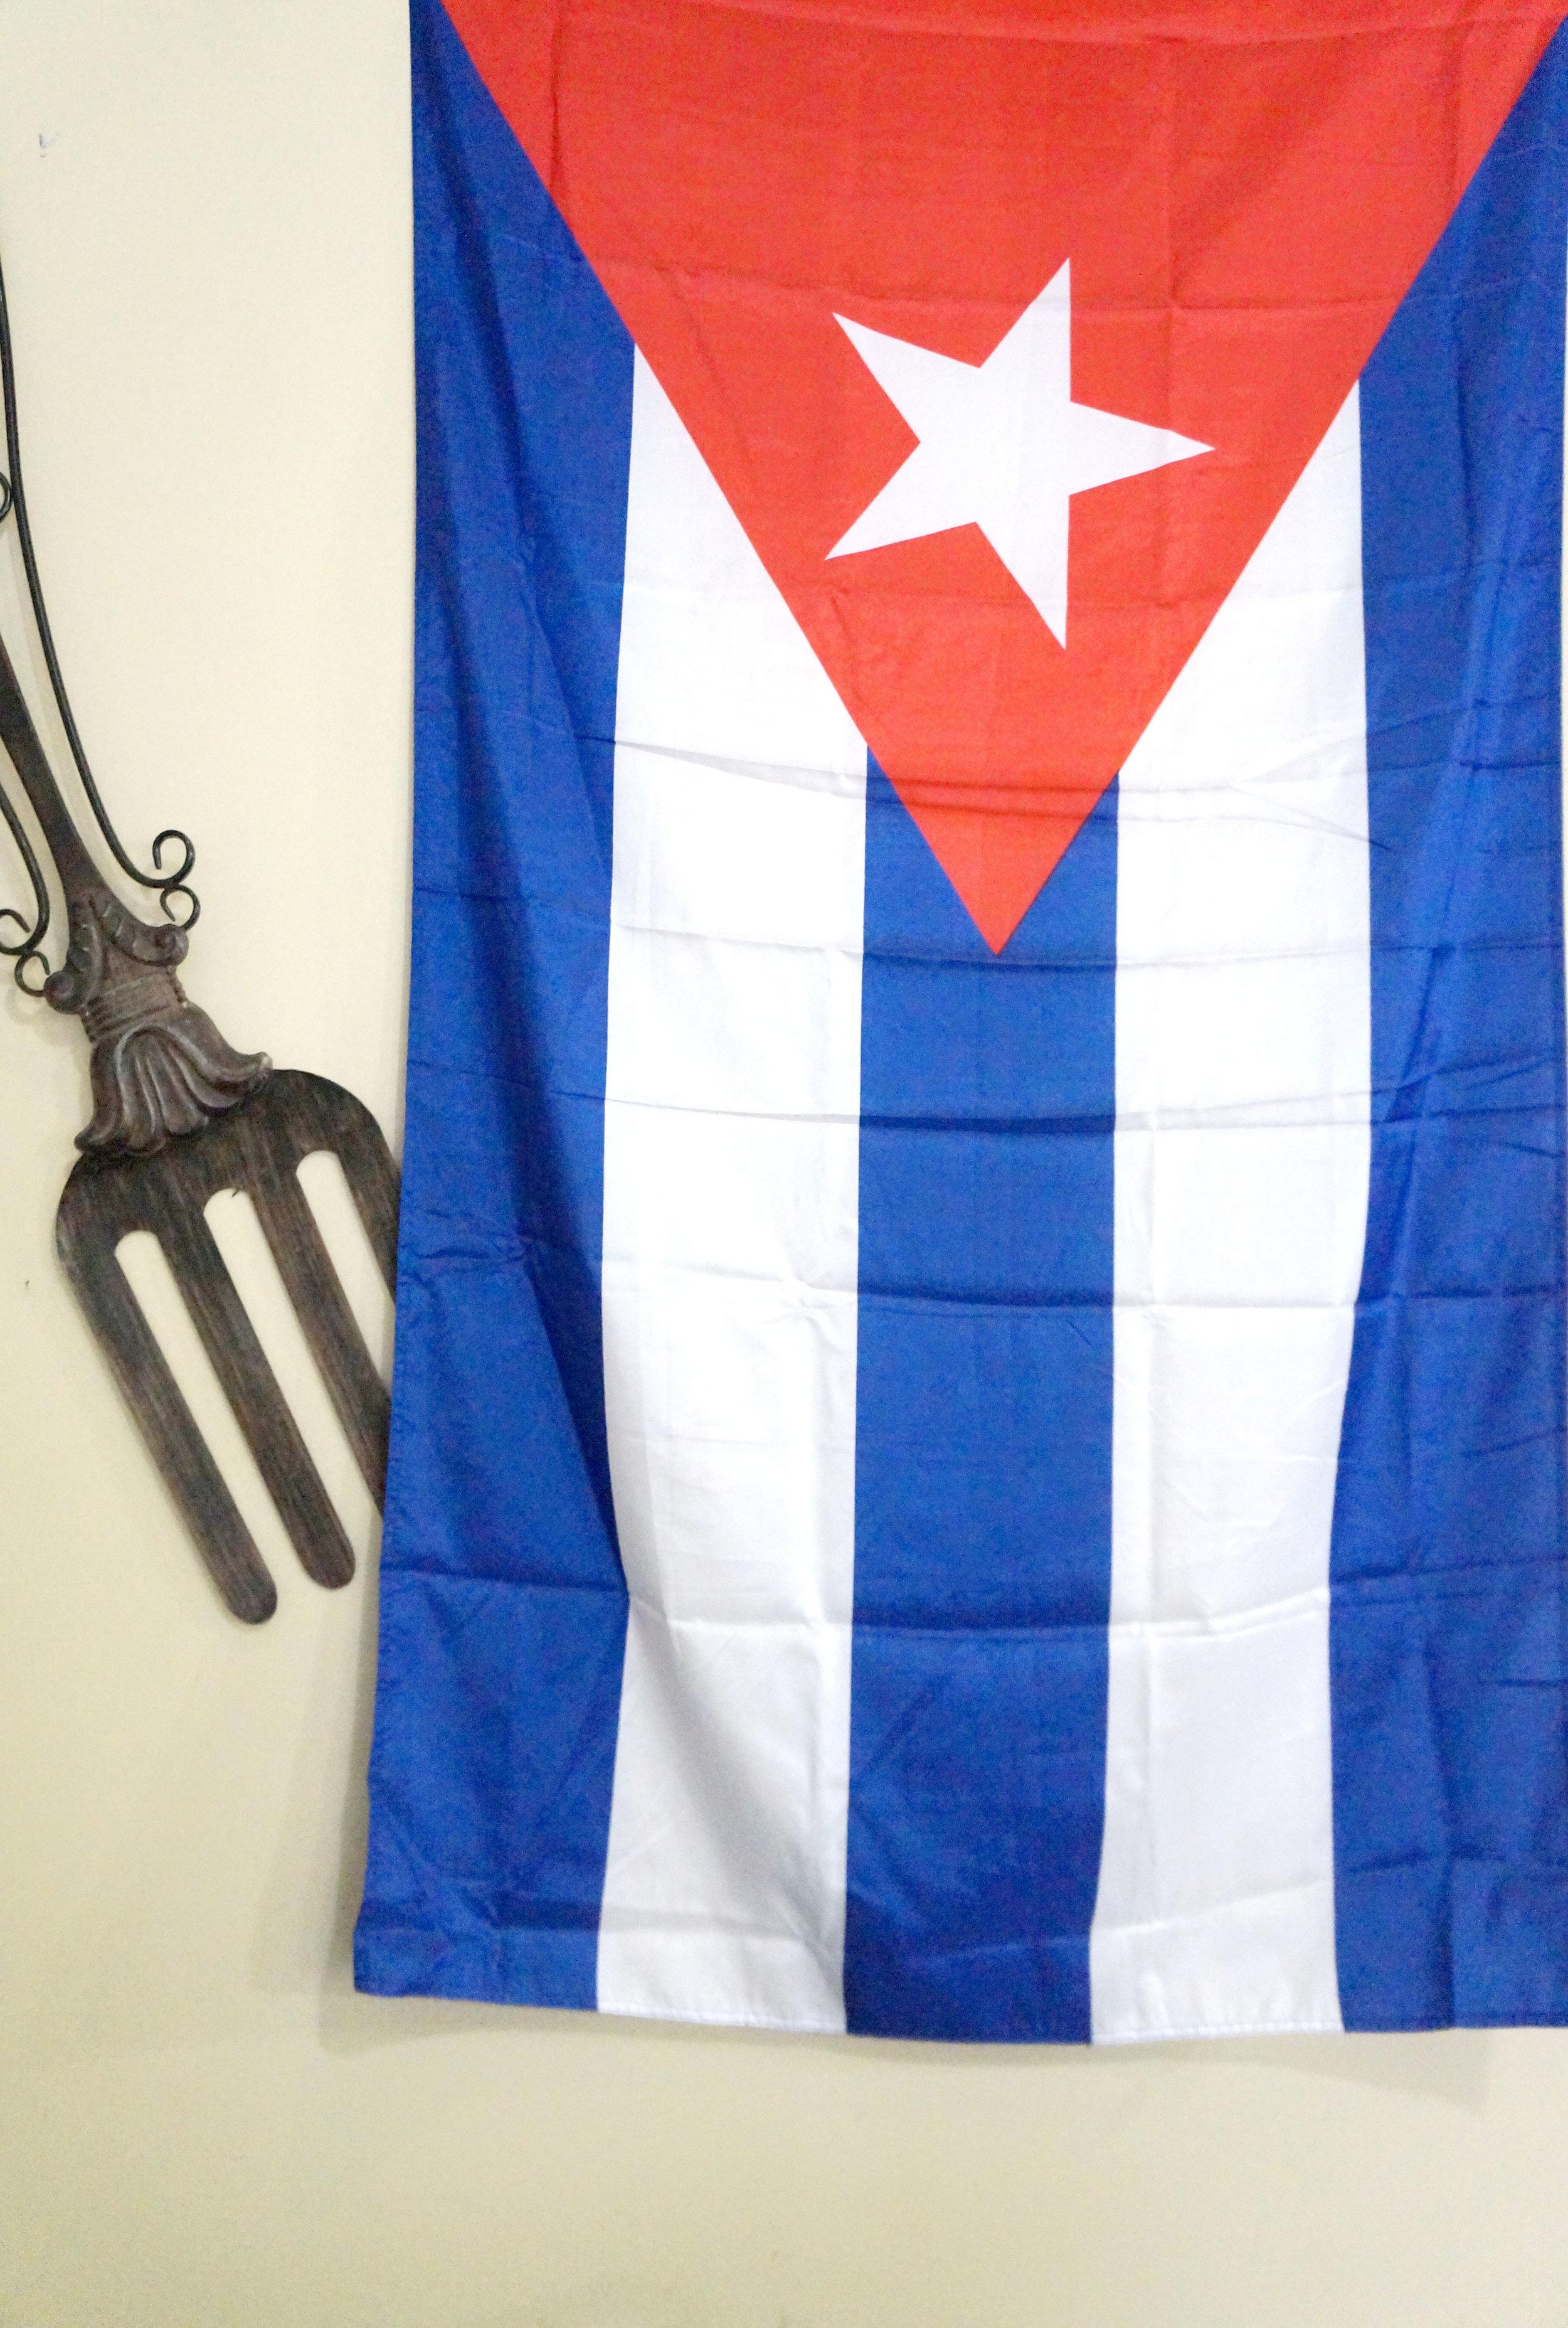 Andrea Fenise Memphis Fashion and Food blogger features Havana Pilon's Cuban Food in Memphis